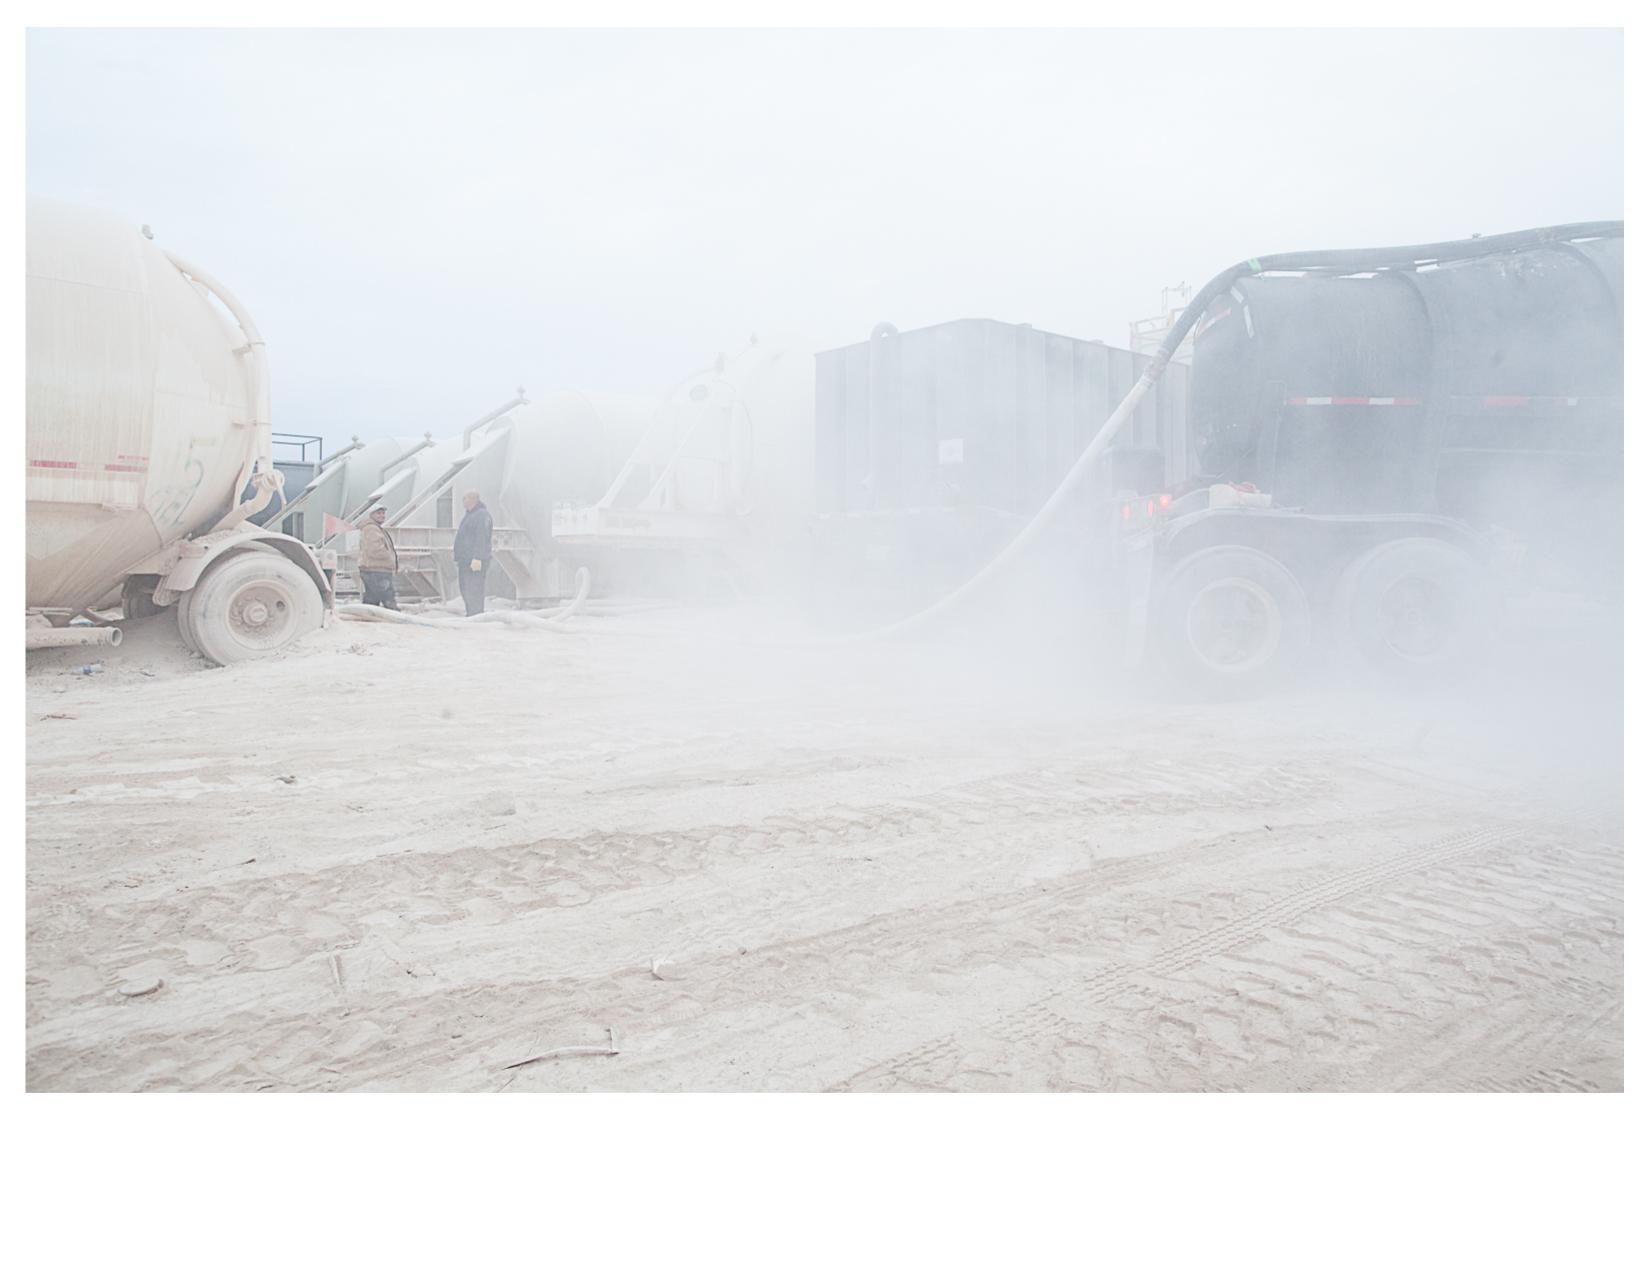 Oilfield Mud Plant, Pecos, TX